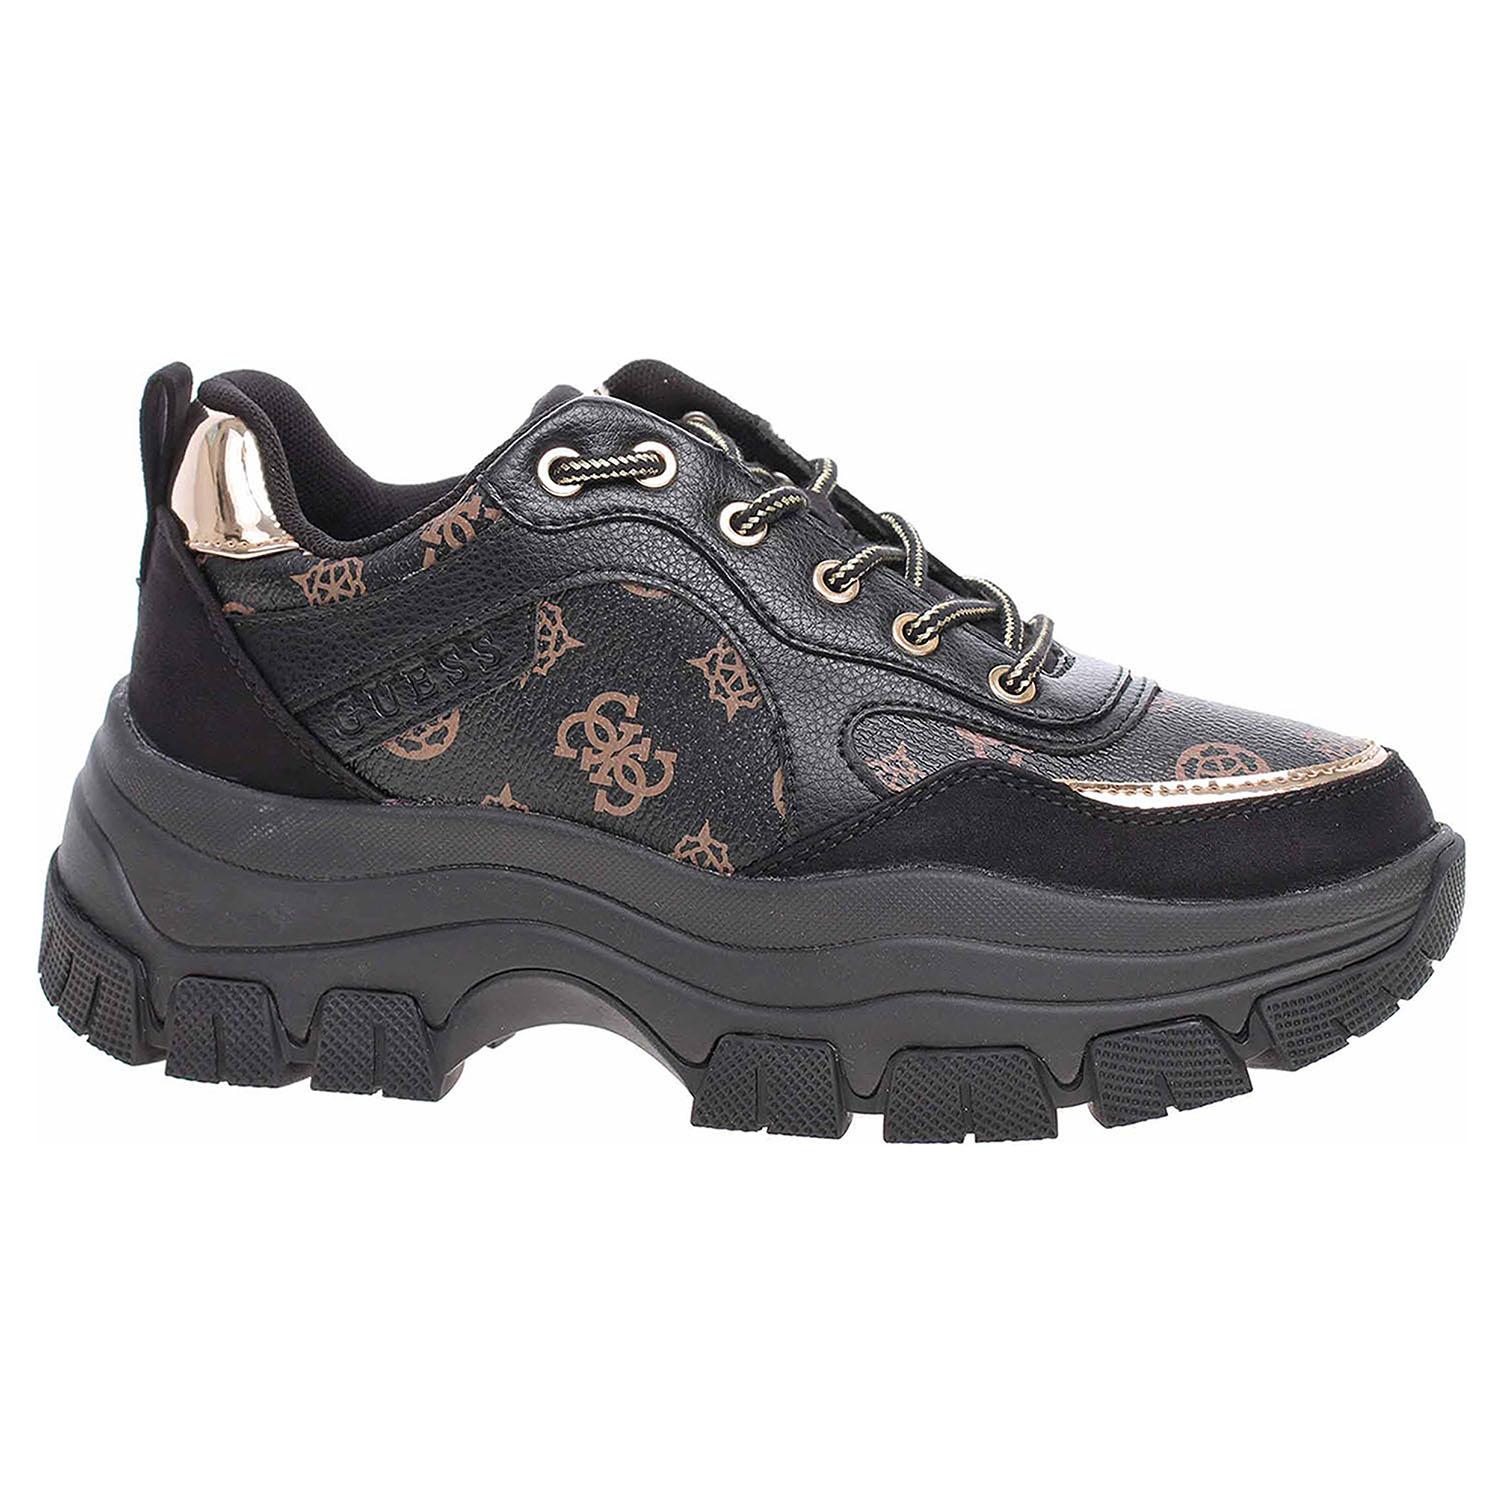 Dámská obuv Guess Baryt black FL8BRYFAL12 36